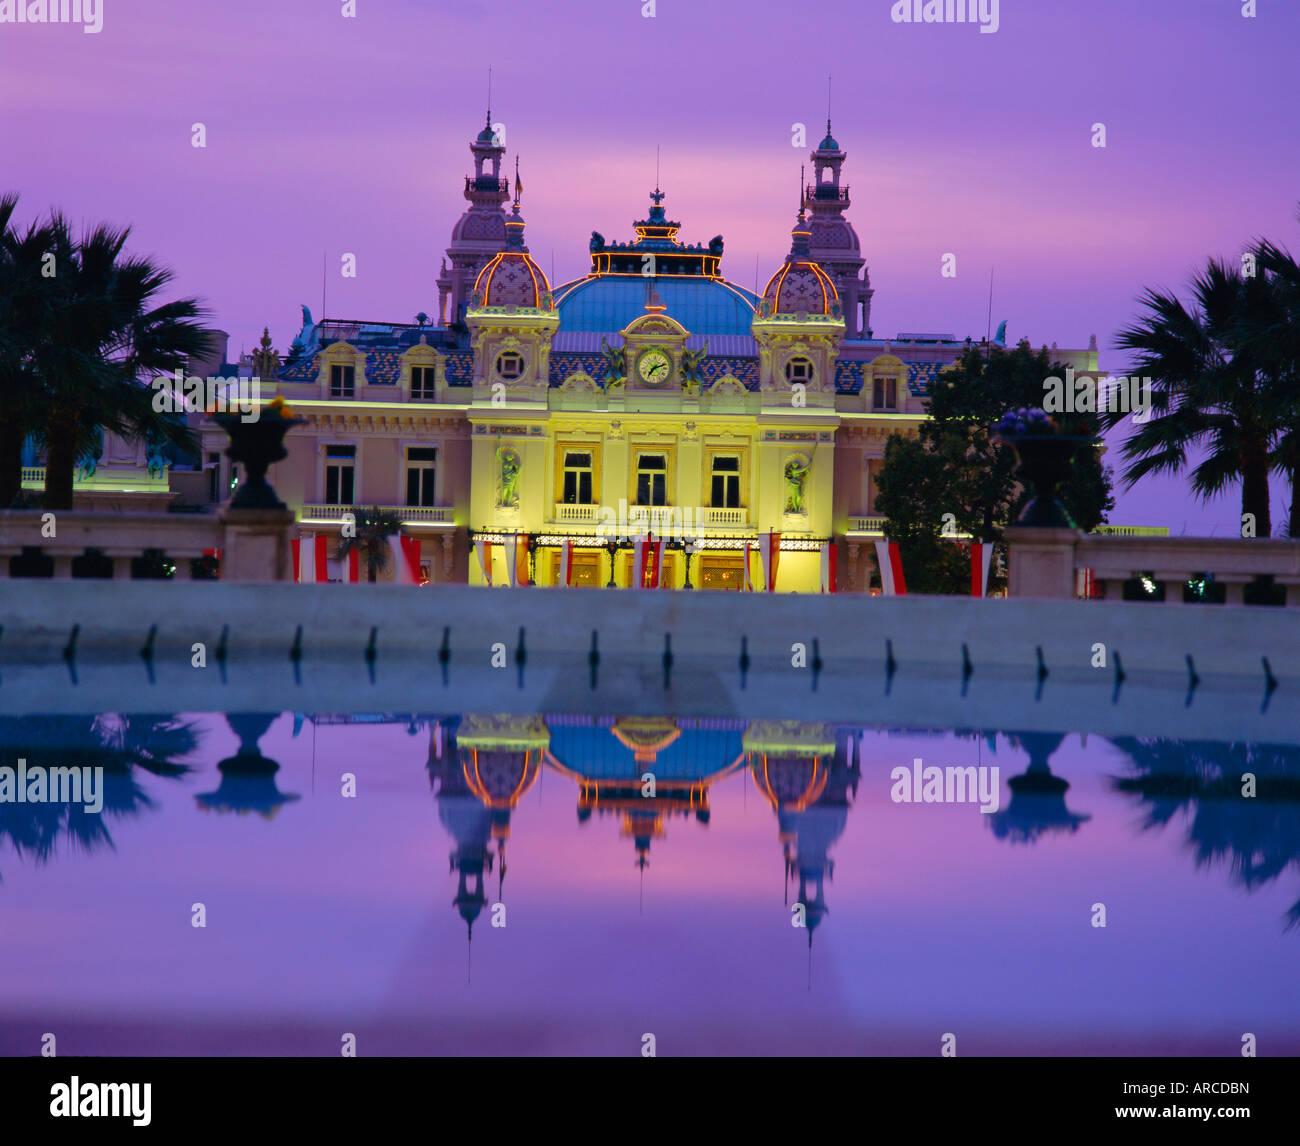 West front of the Casino, Monte Carlo, Monaco, Europe - Stock Image